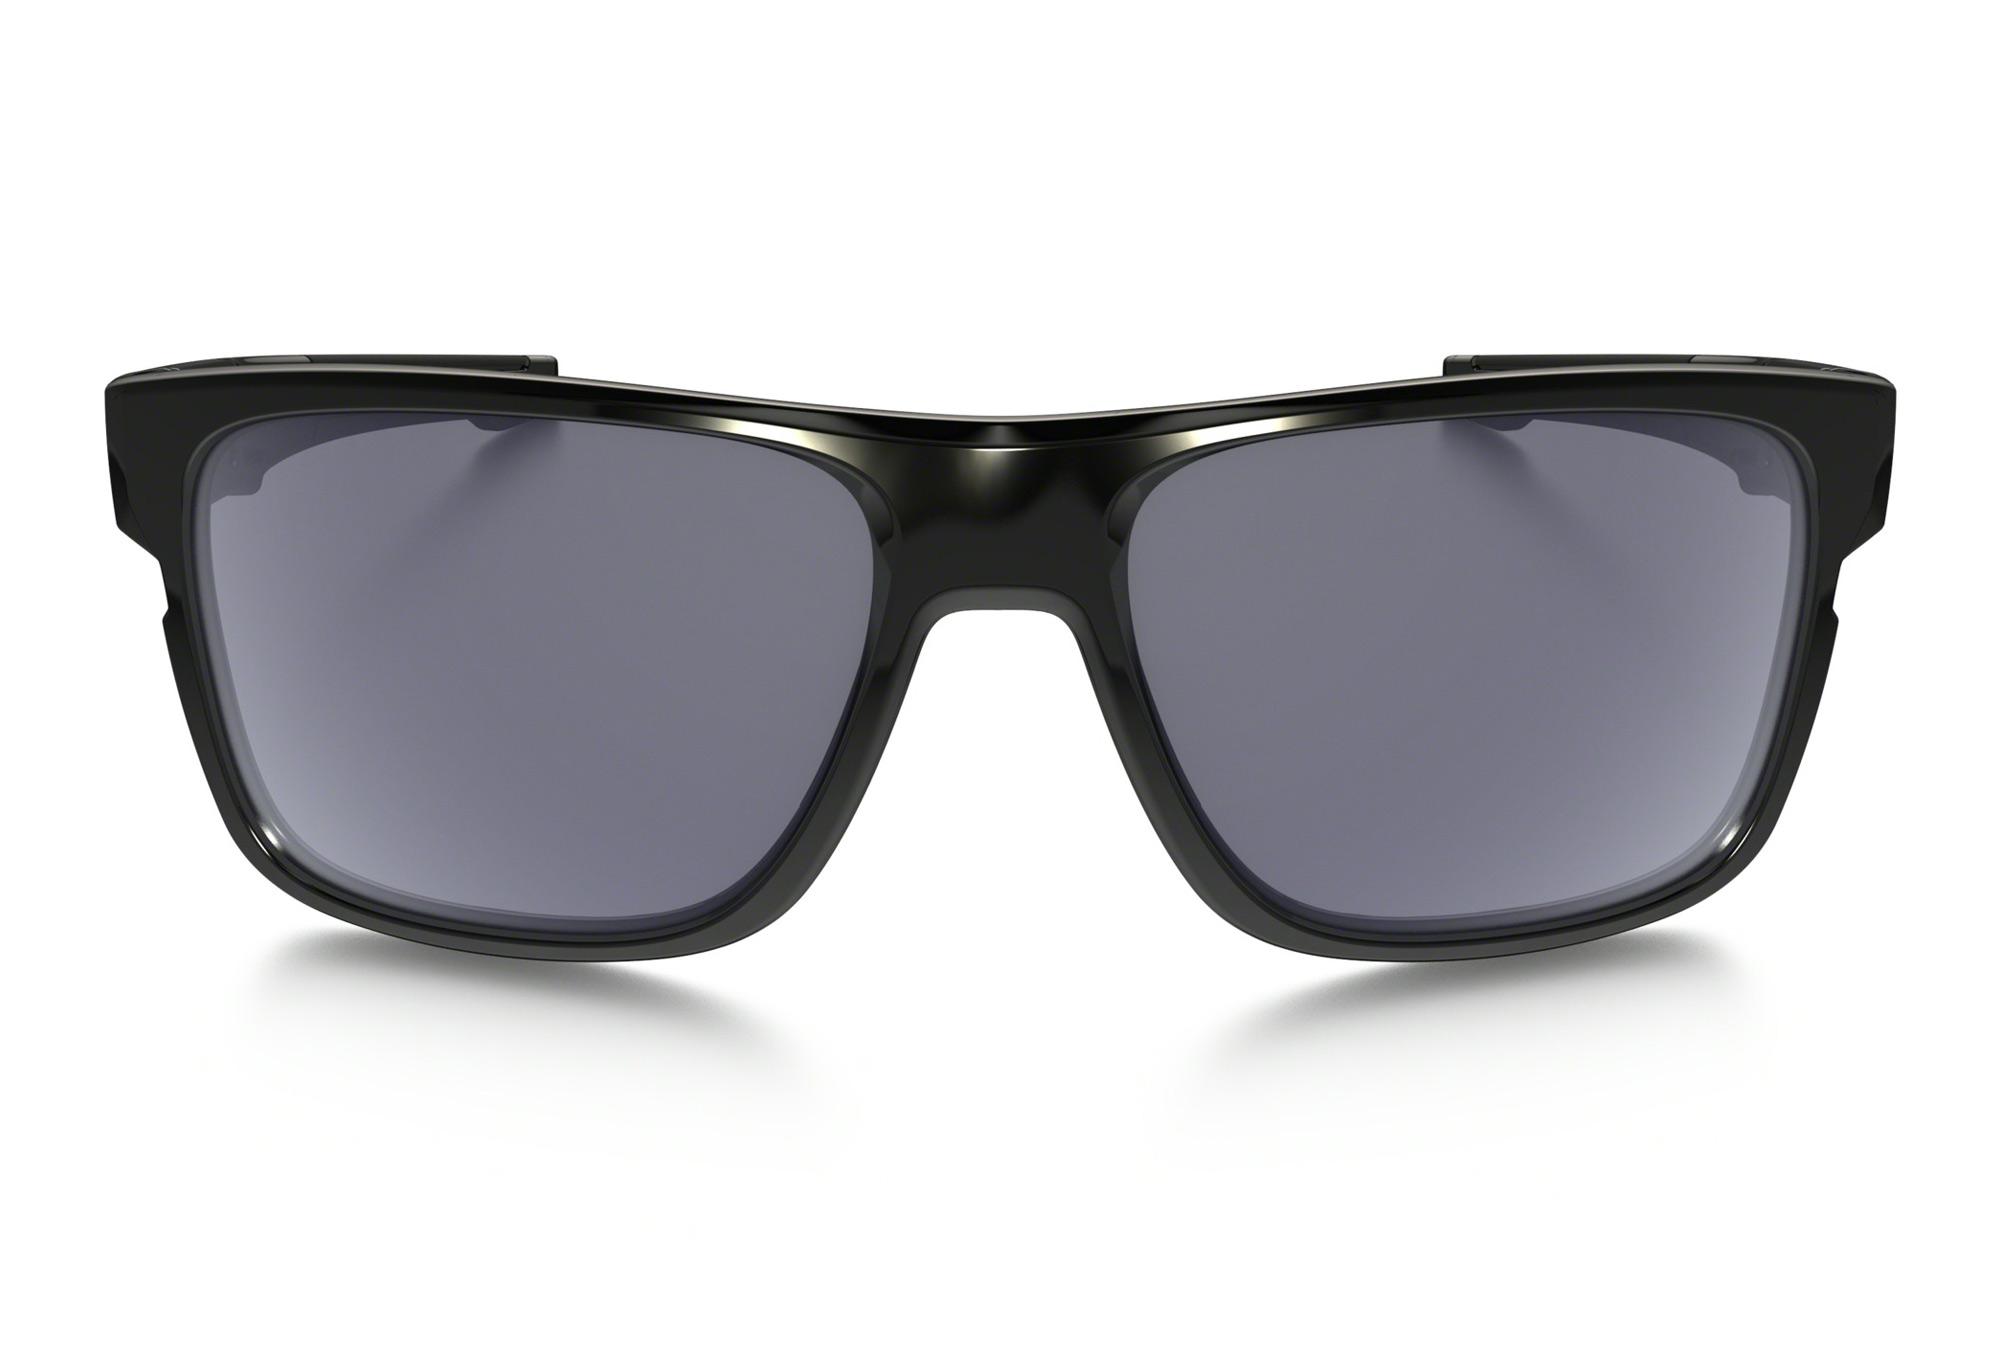 OAKLEY Sunglasses Crossrange Polished BlackGrey Ref OO9361